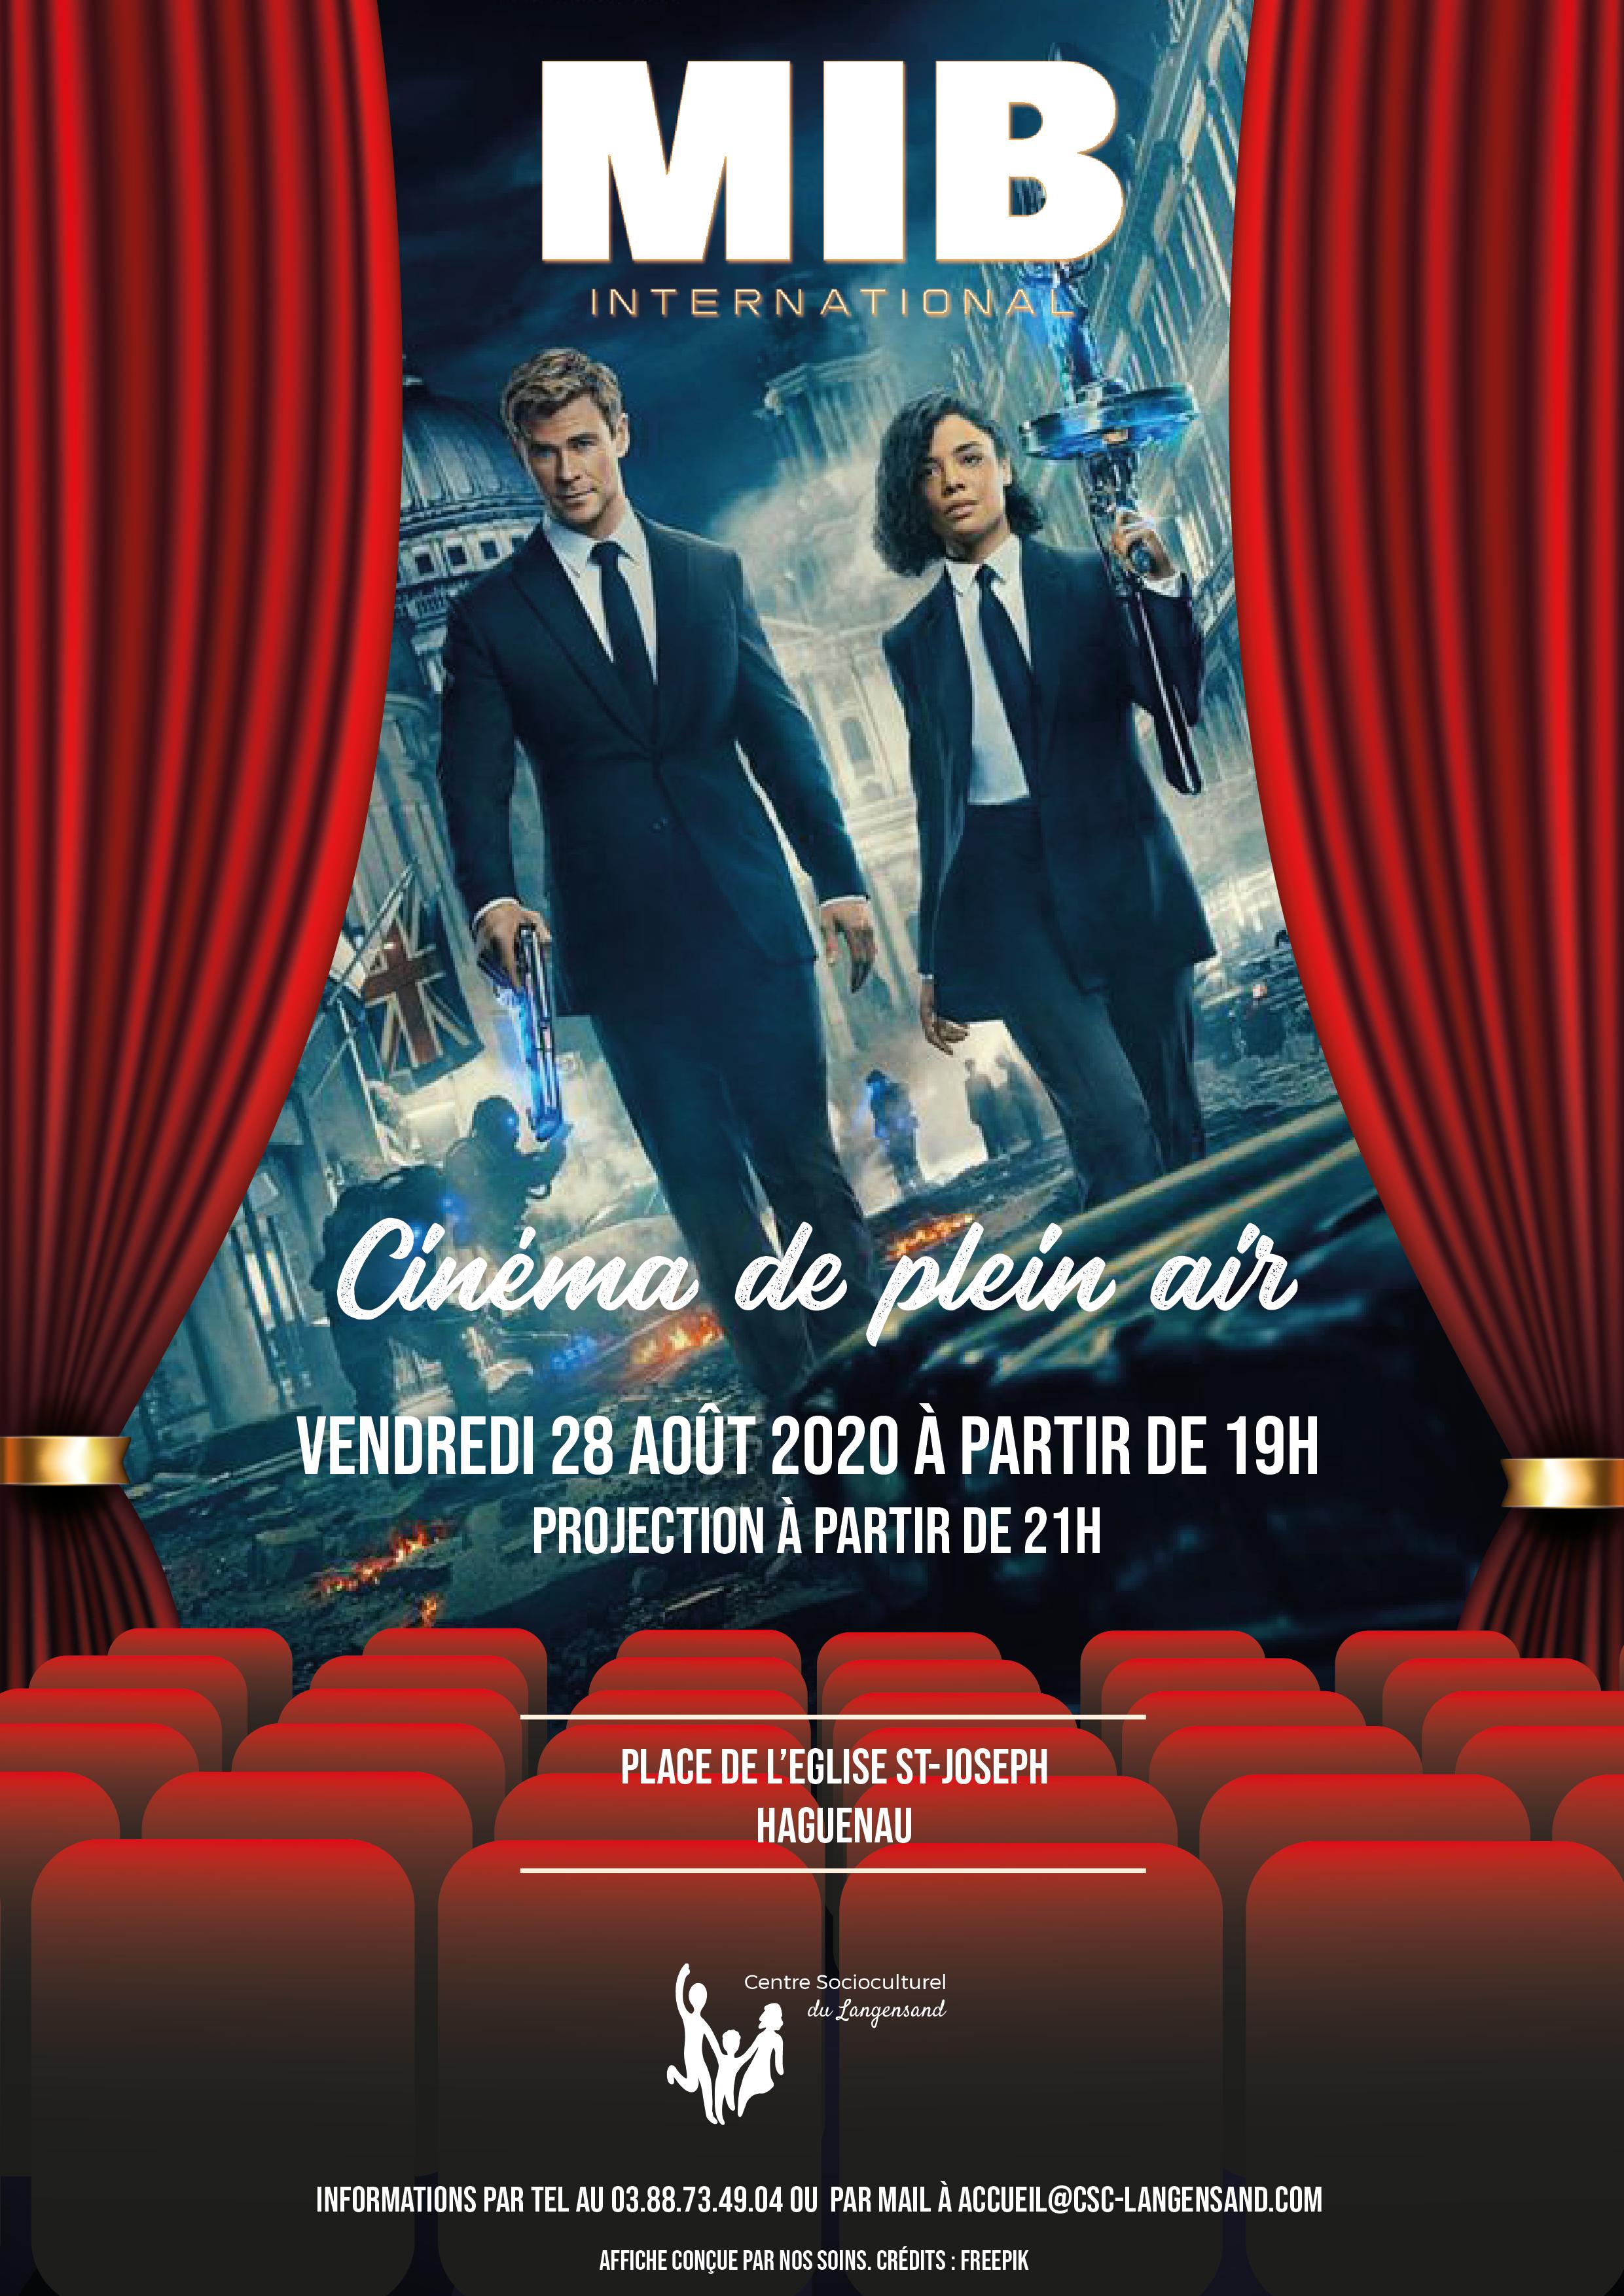 Soirée cinéma de plein air - Men in Black : International